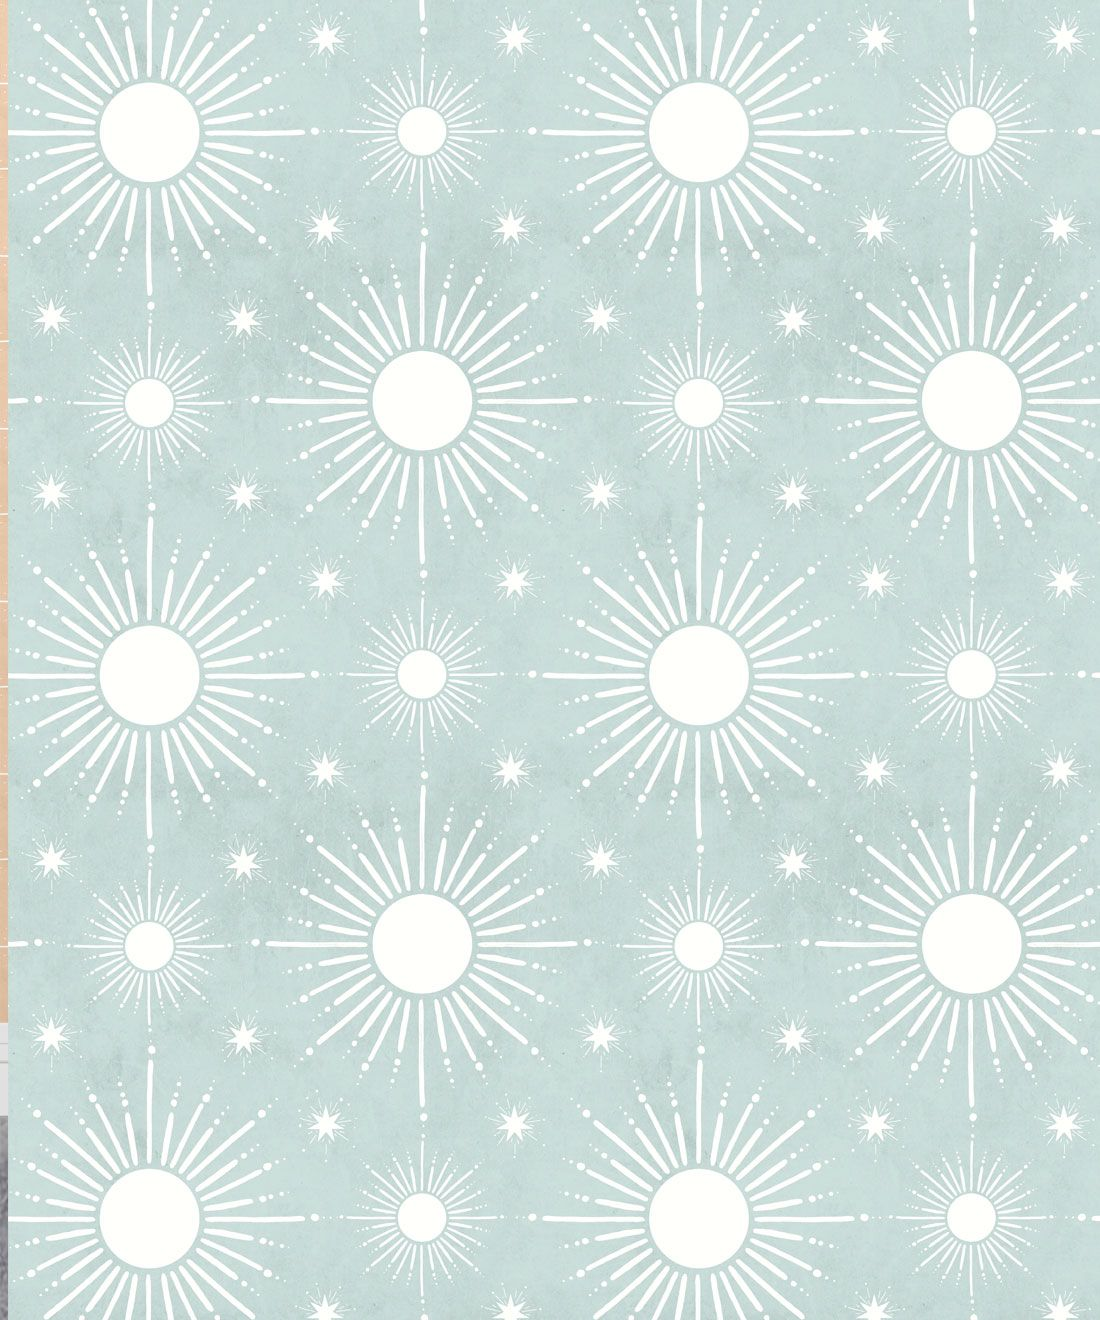 Sun Light Star Bright Wallpaper • Sea Spray • Swatch